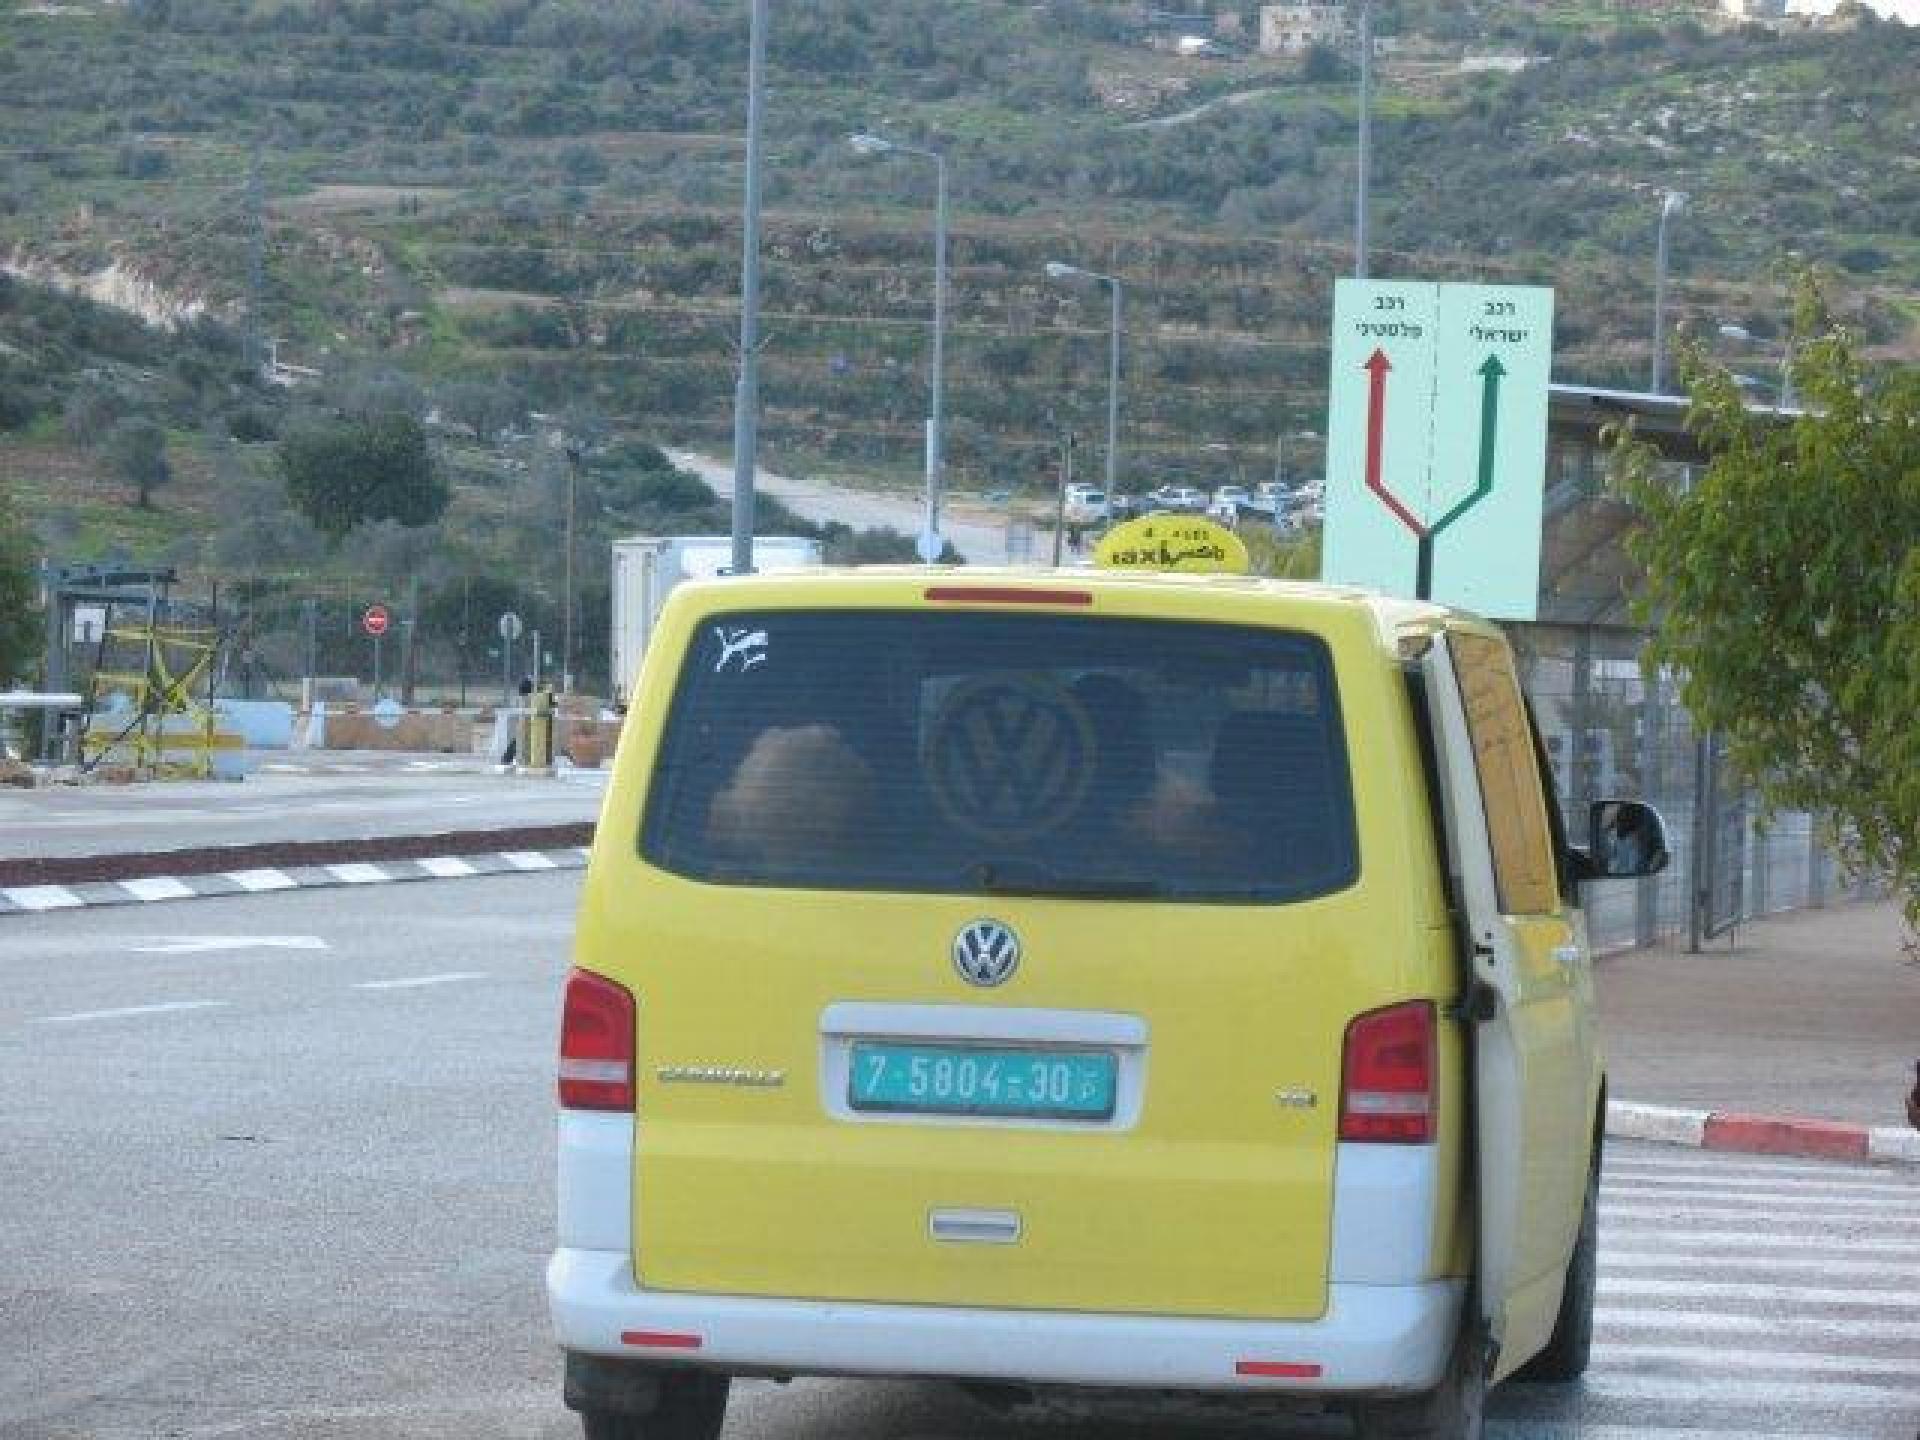 Barta'a/Reikhan checkpoint 28.01.12